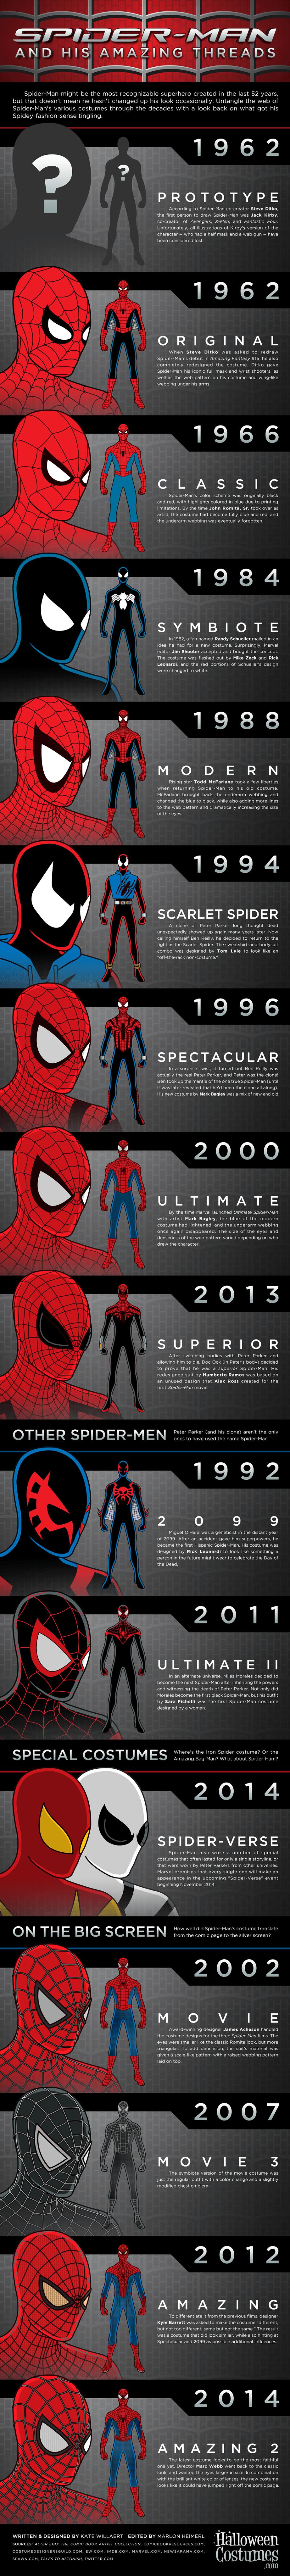 Spider Man Infographic Costume Evolution 1962 2014 Geektyrant